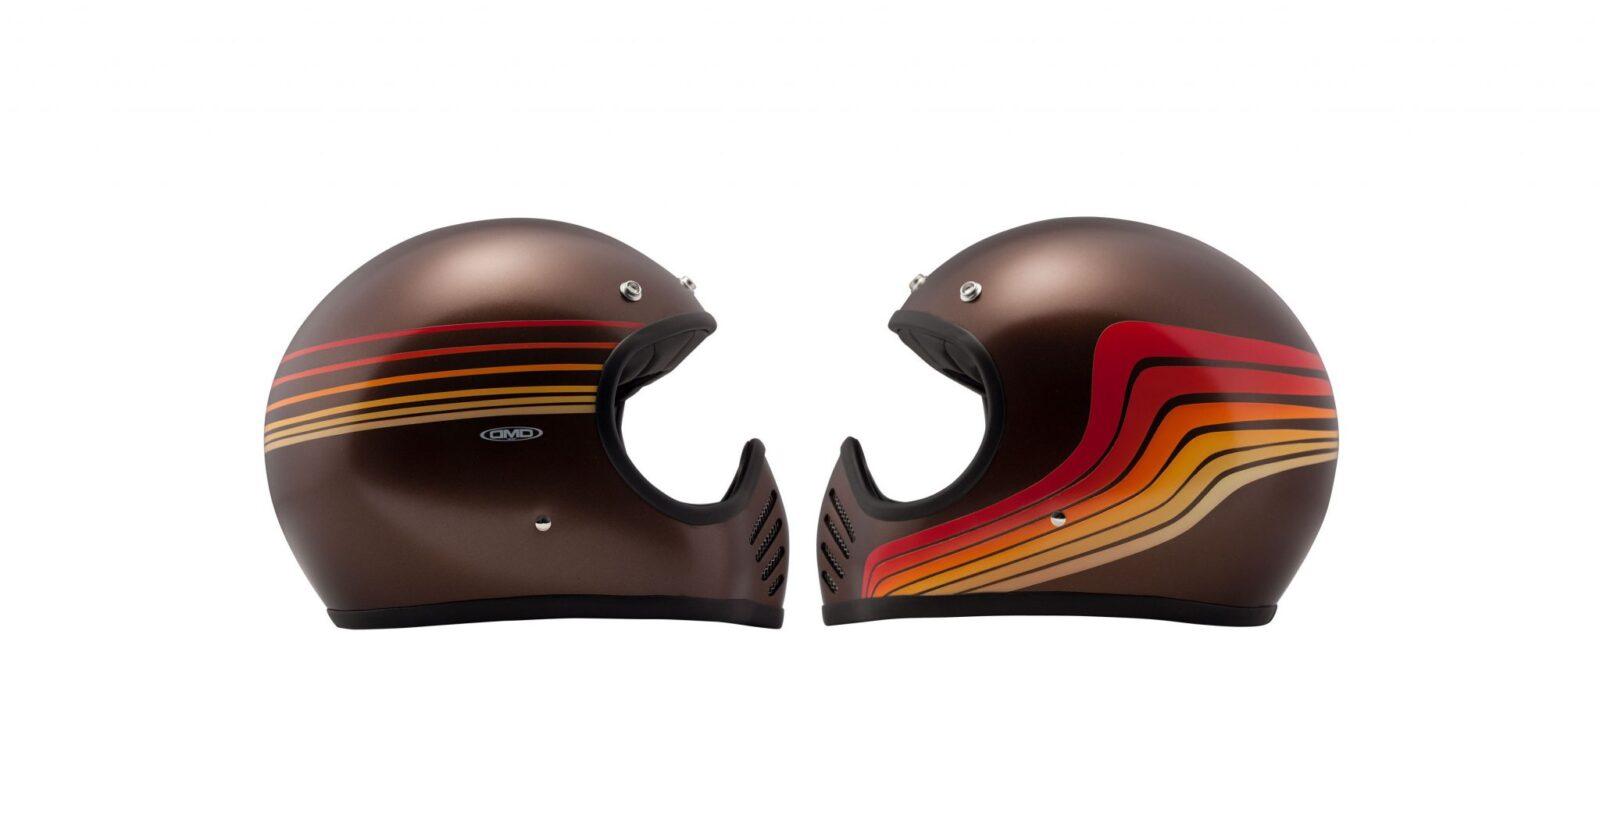 DMD Seventy Five Waves Helmet 3 1600x834 - DMD Seventy Five Waves Helmet